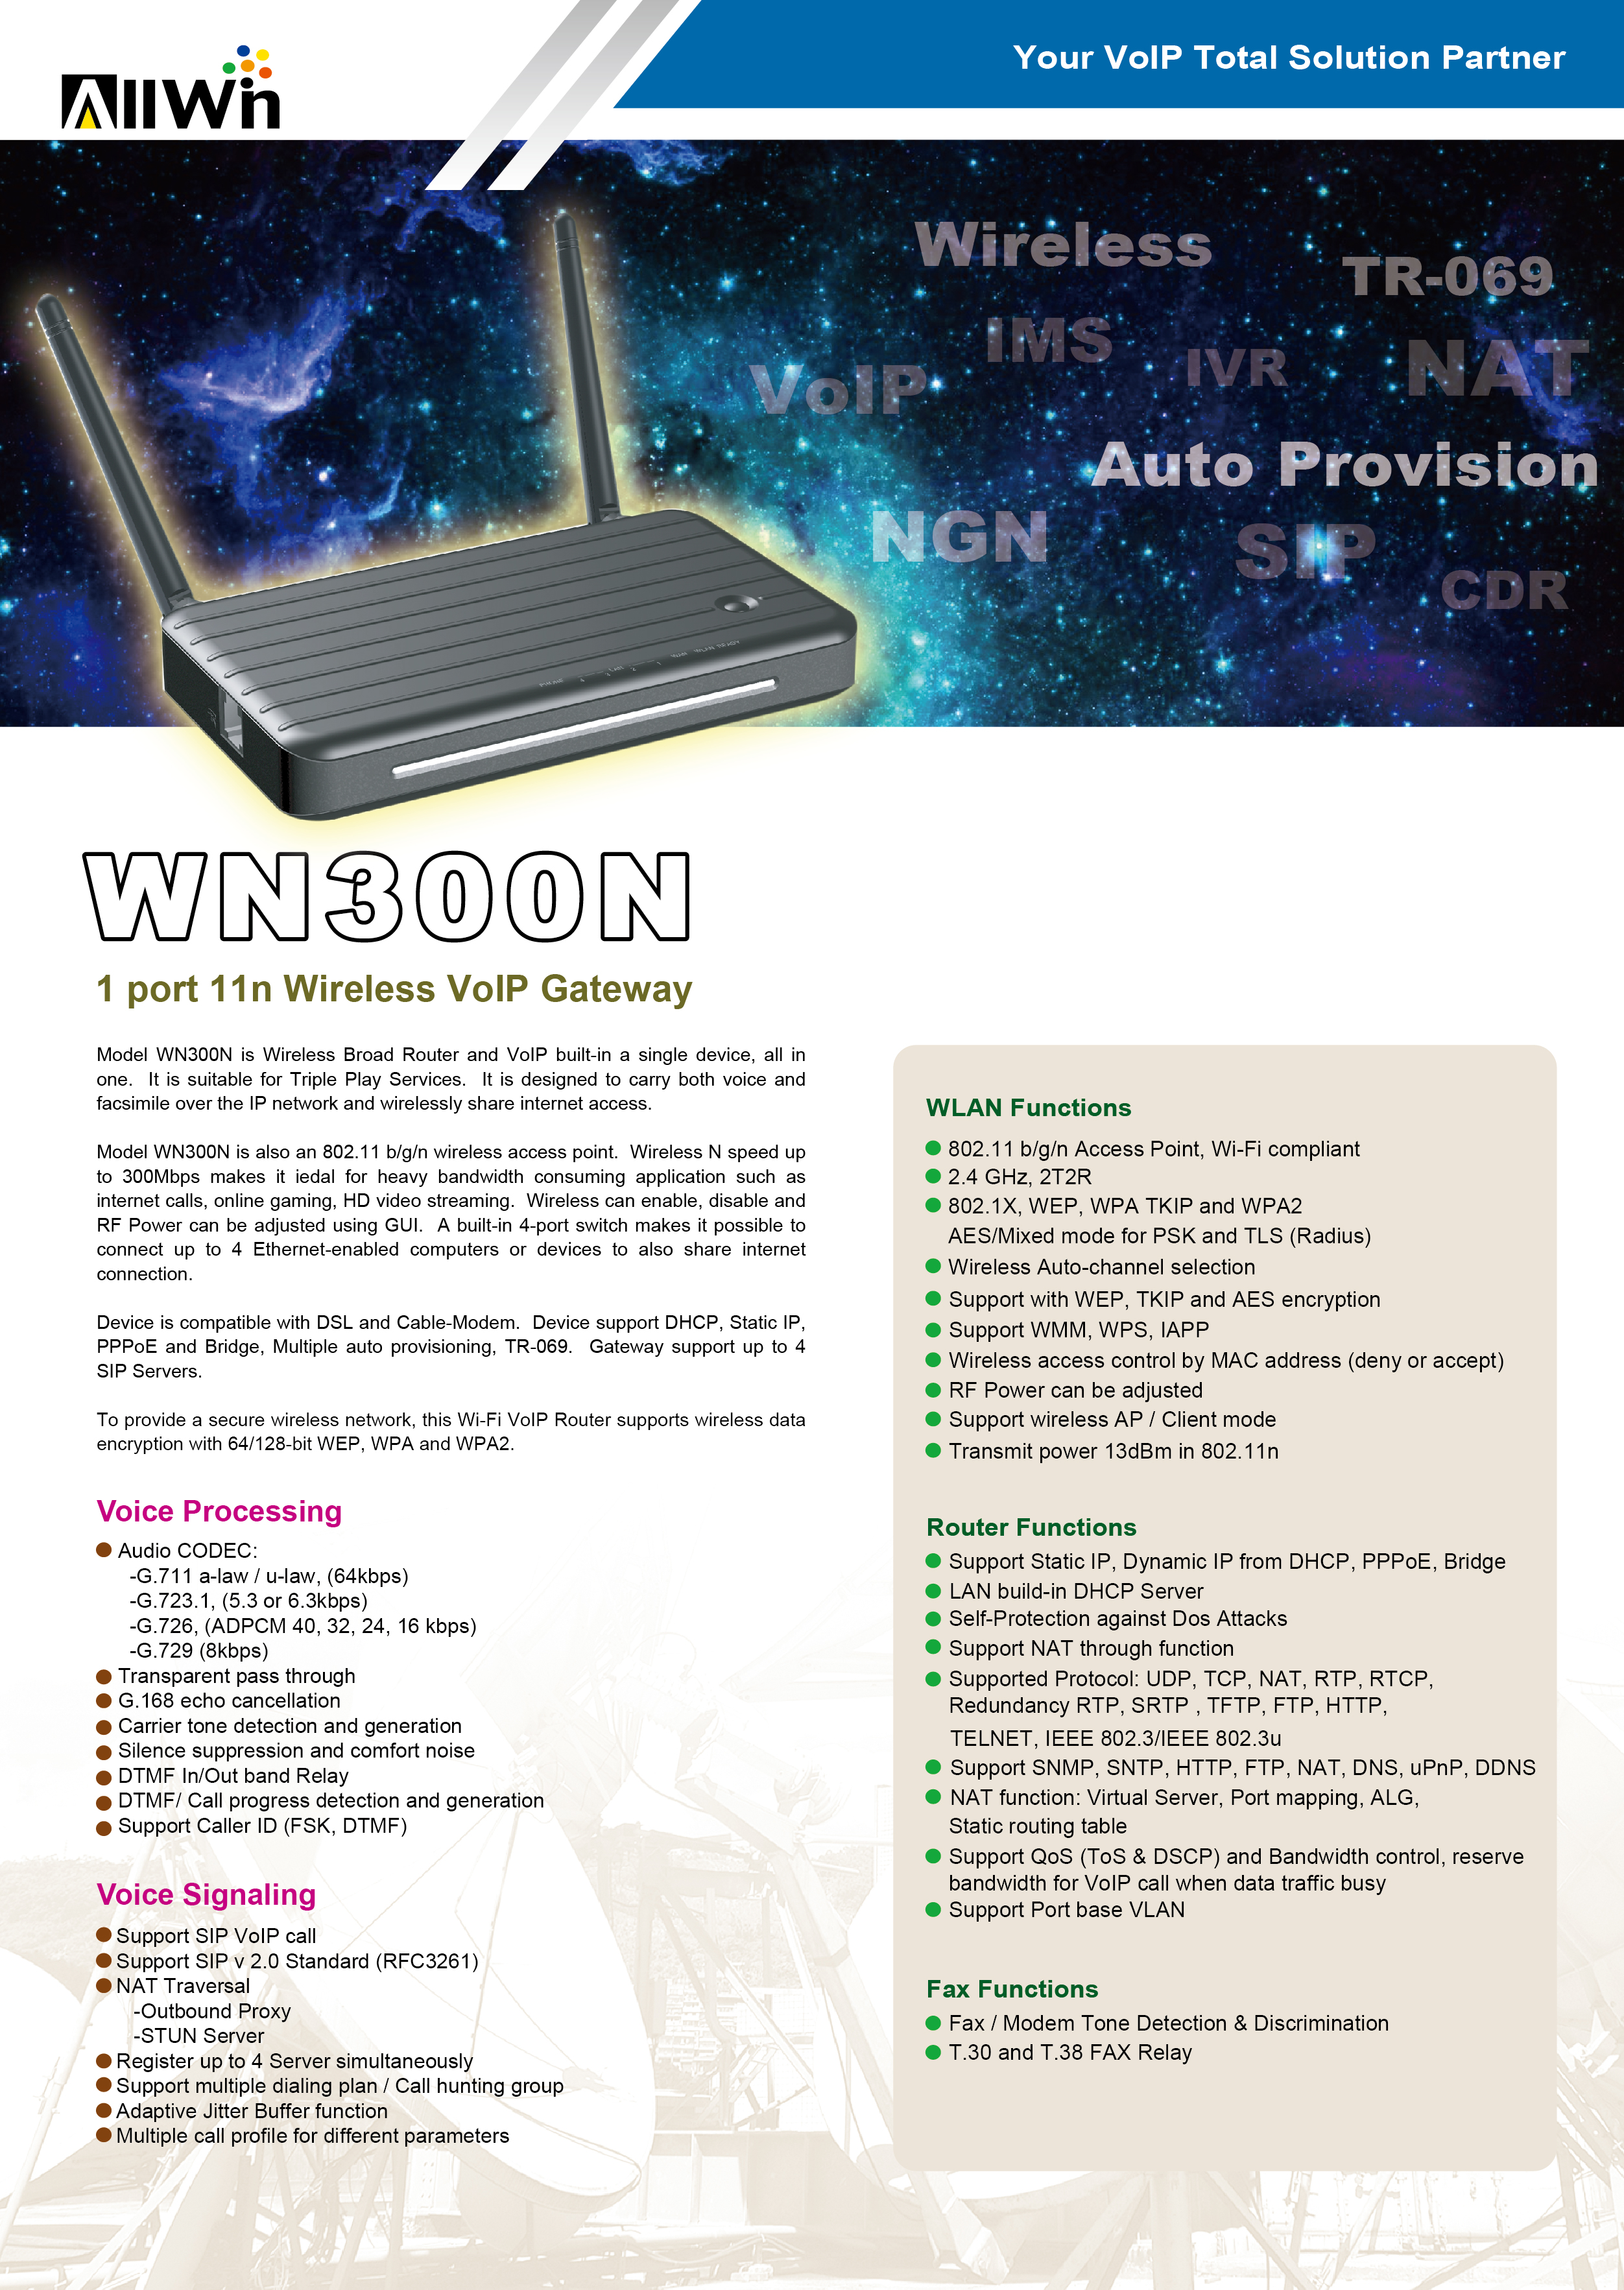 Wifi VoIP Router - ALLWIN TECH